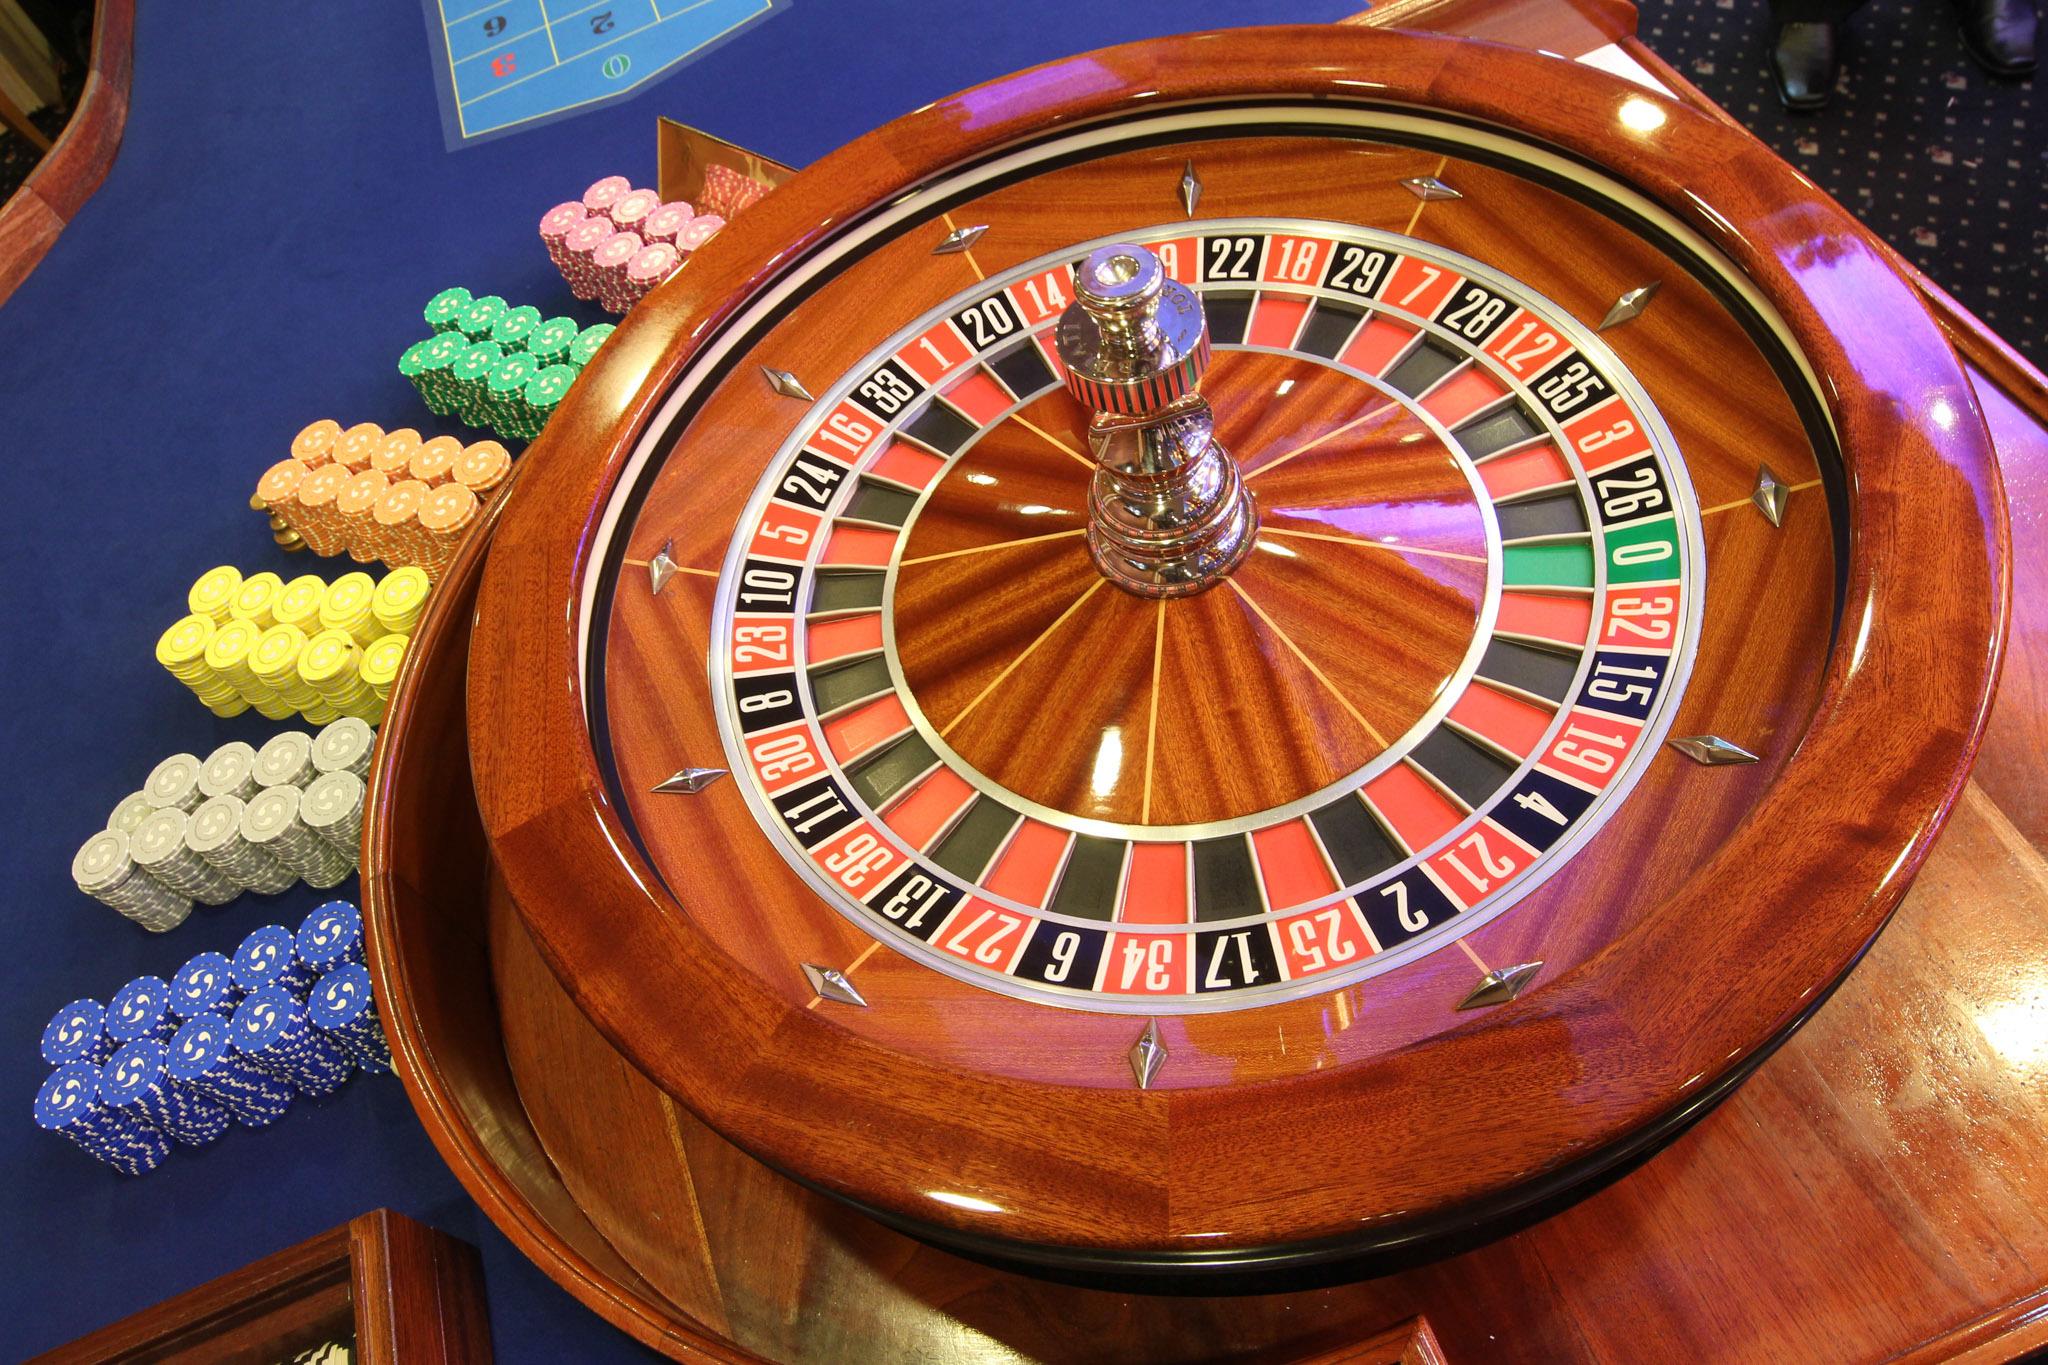 Marina casino colombo contact casino tangiers